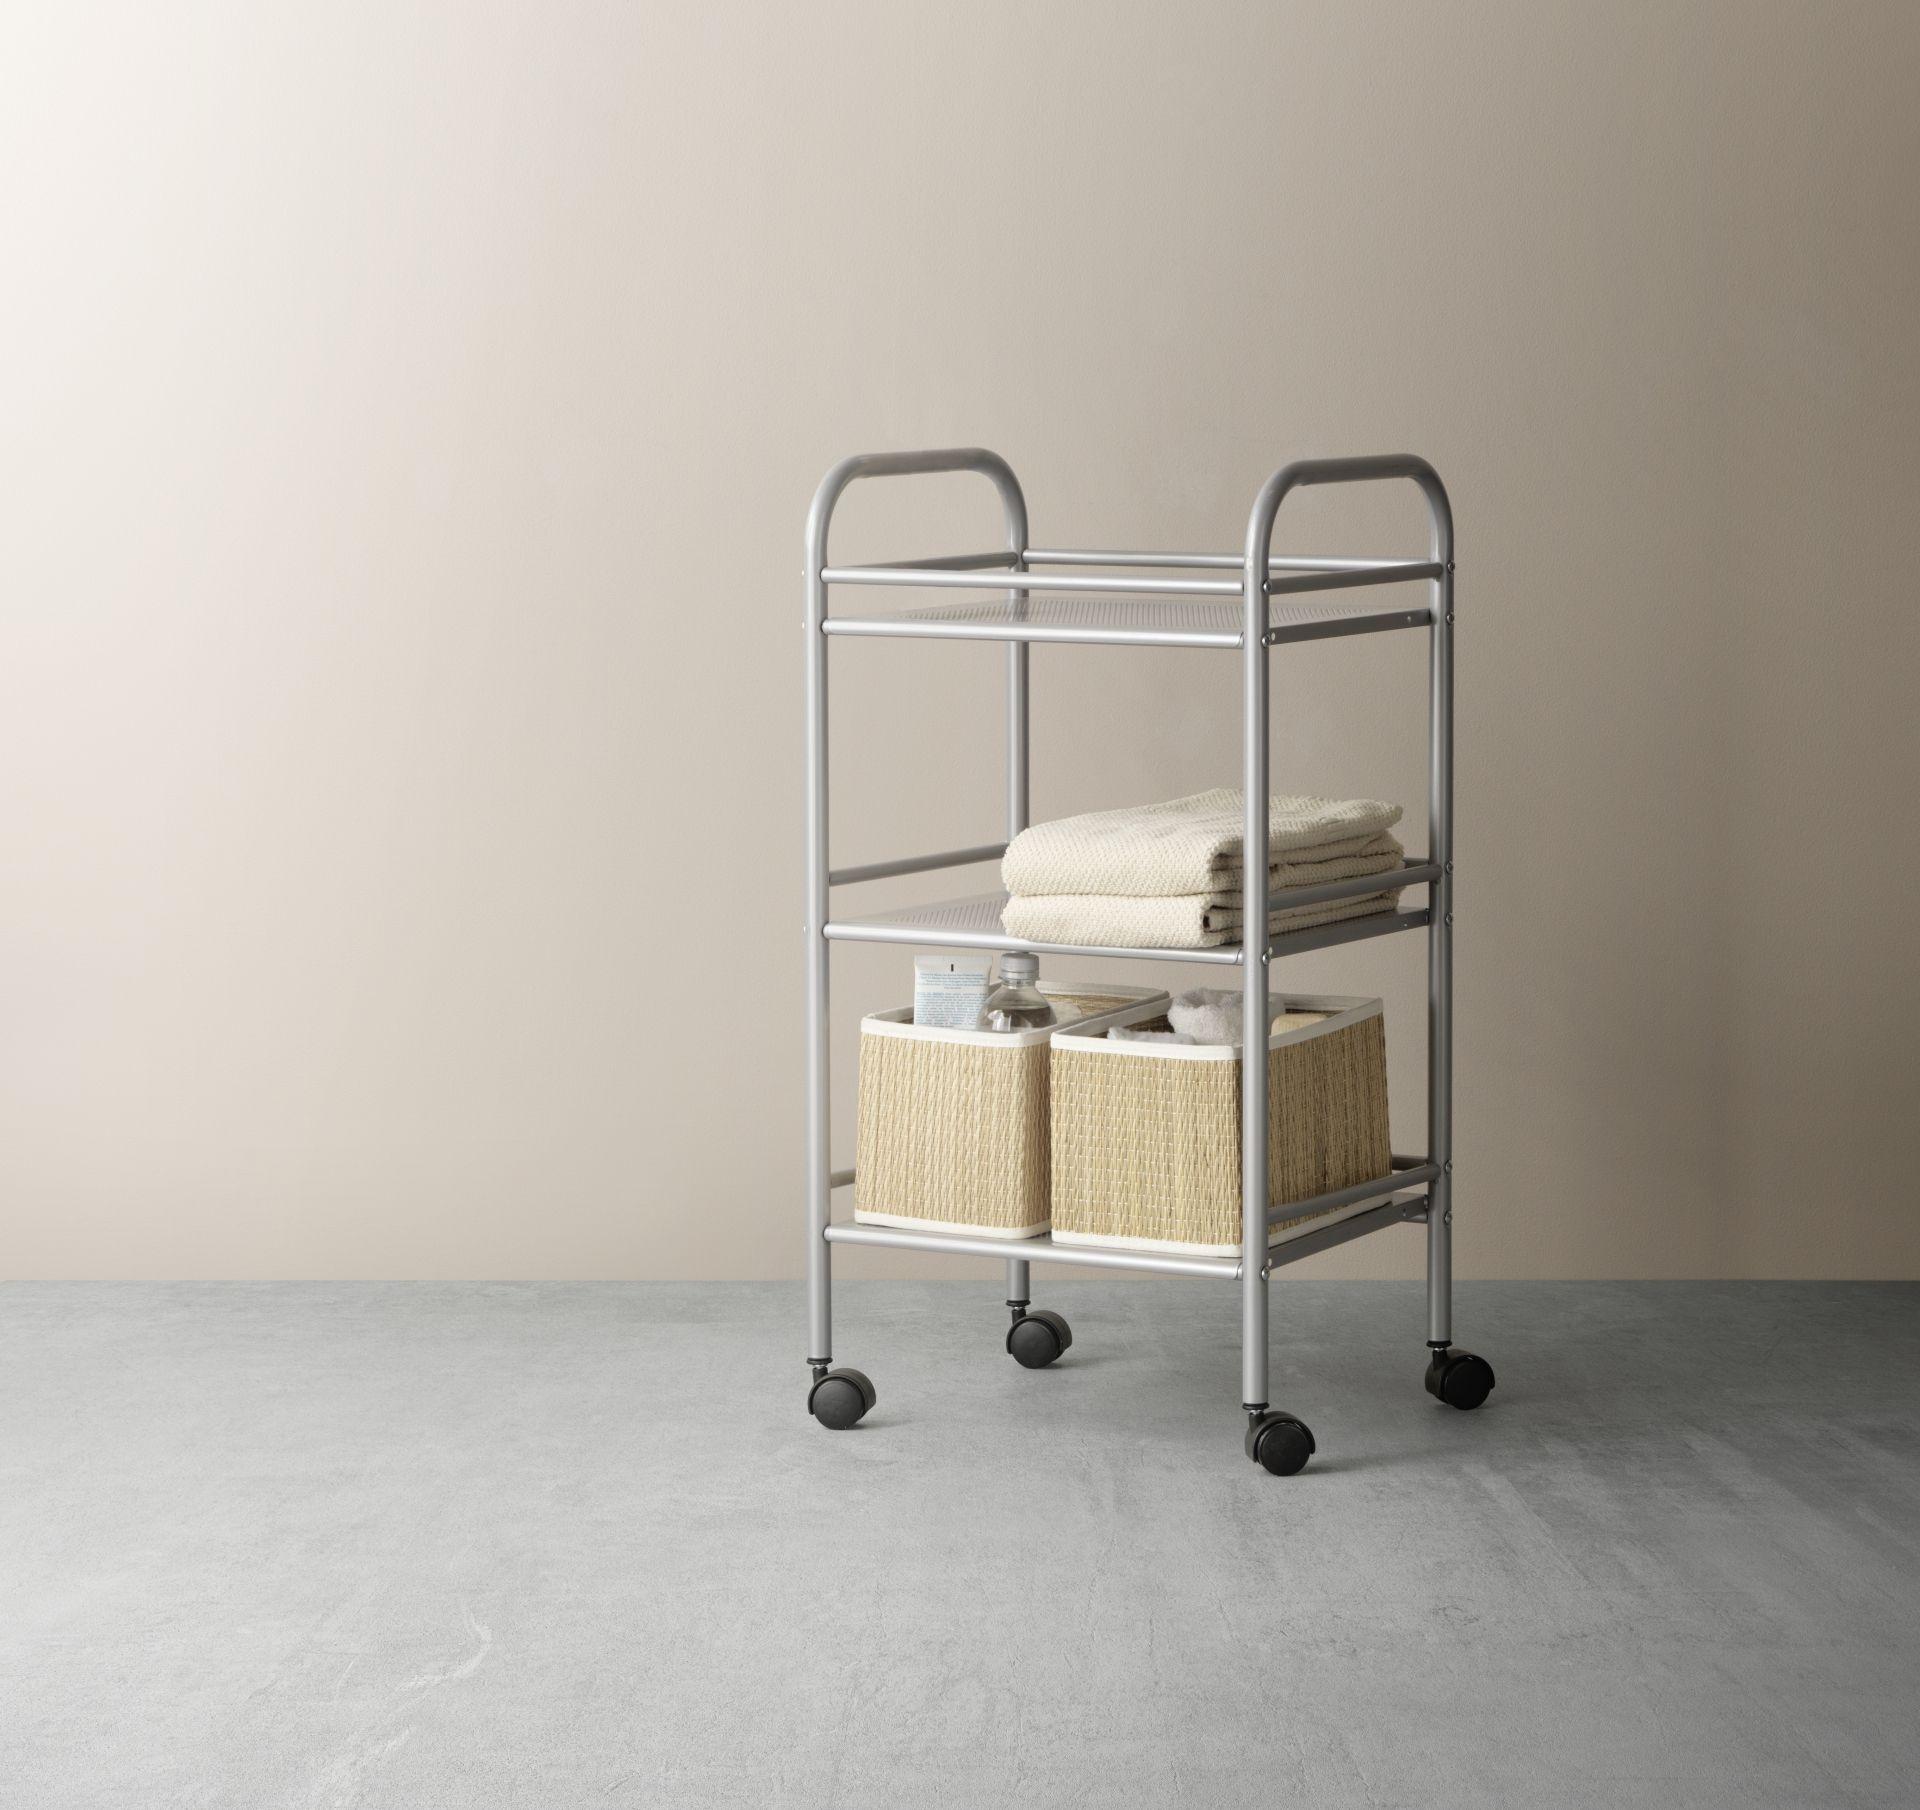 DRAGGAN Kastje op wielen, zilverkleur | Room